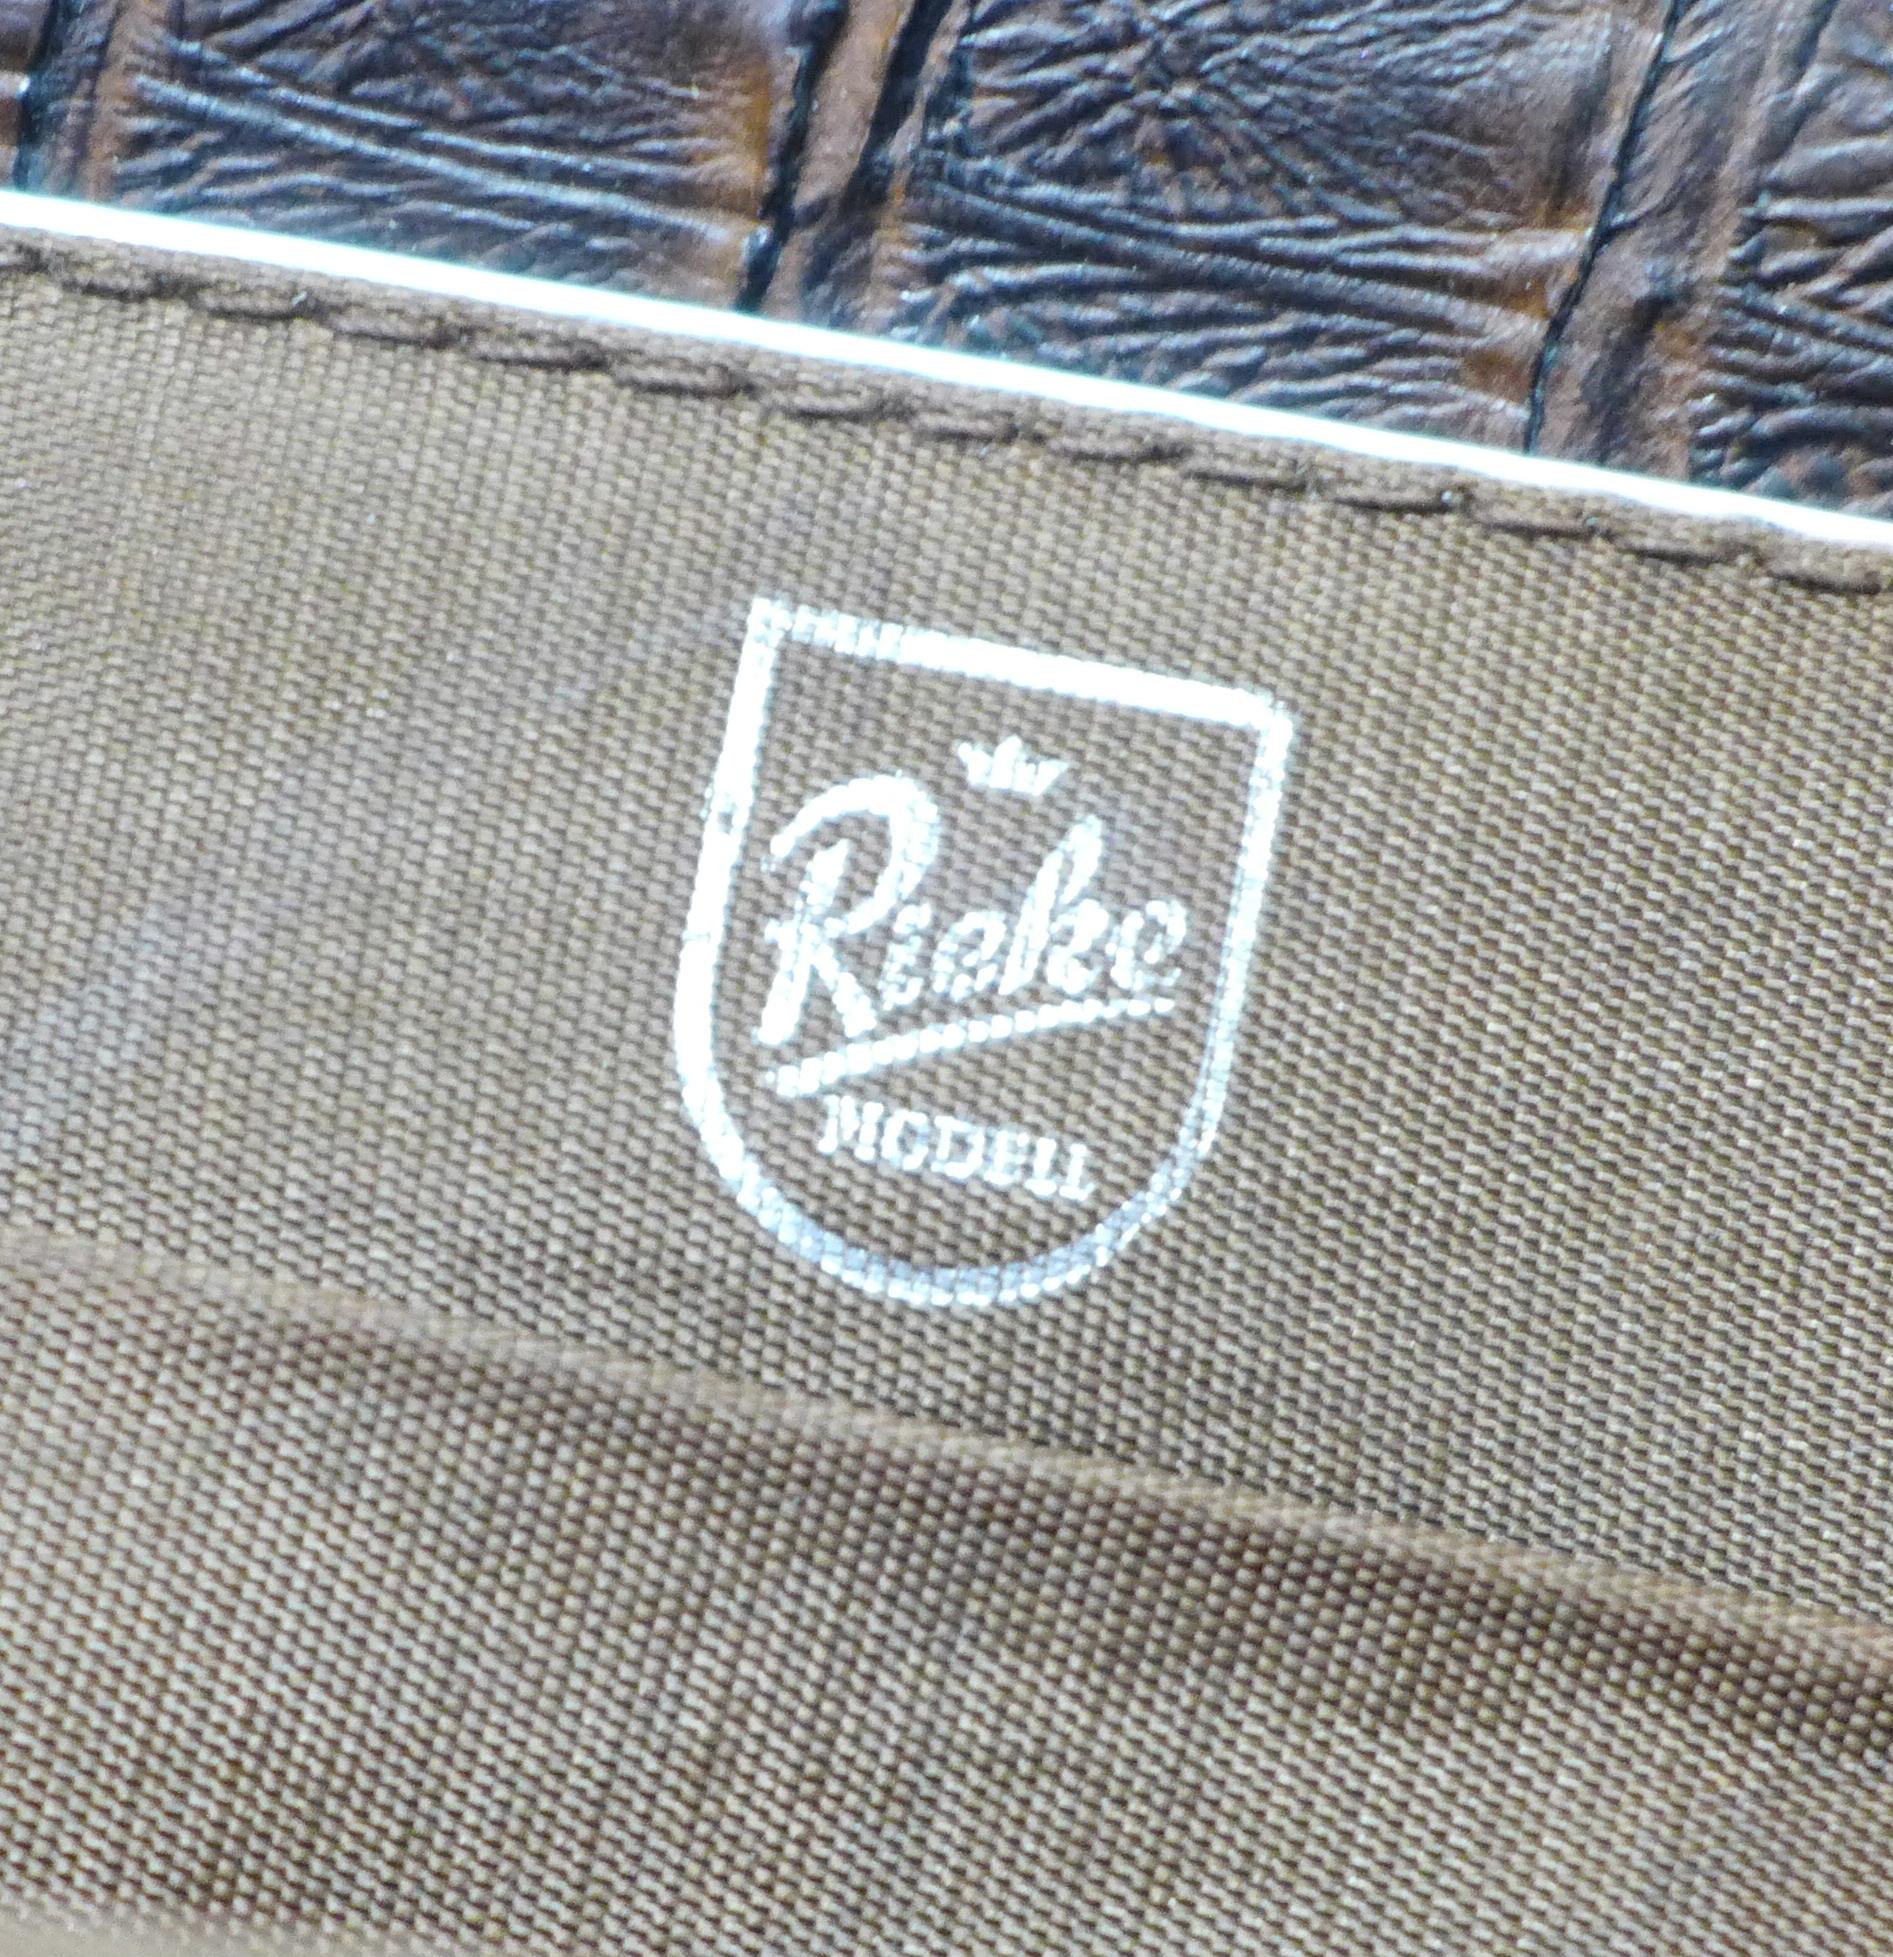 A Rieke vintage faux crocodile skin handbag - Image 4 of 4